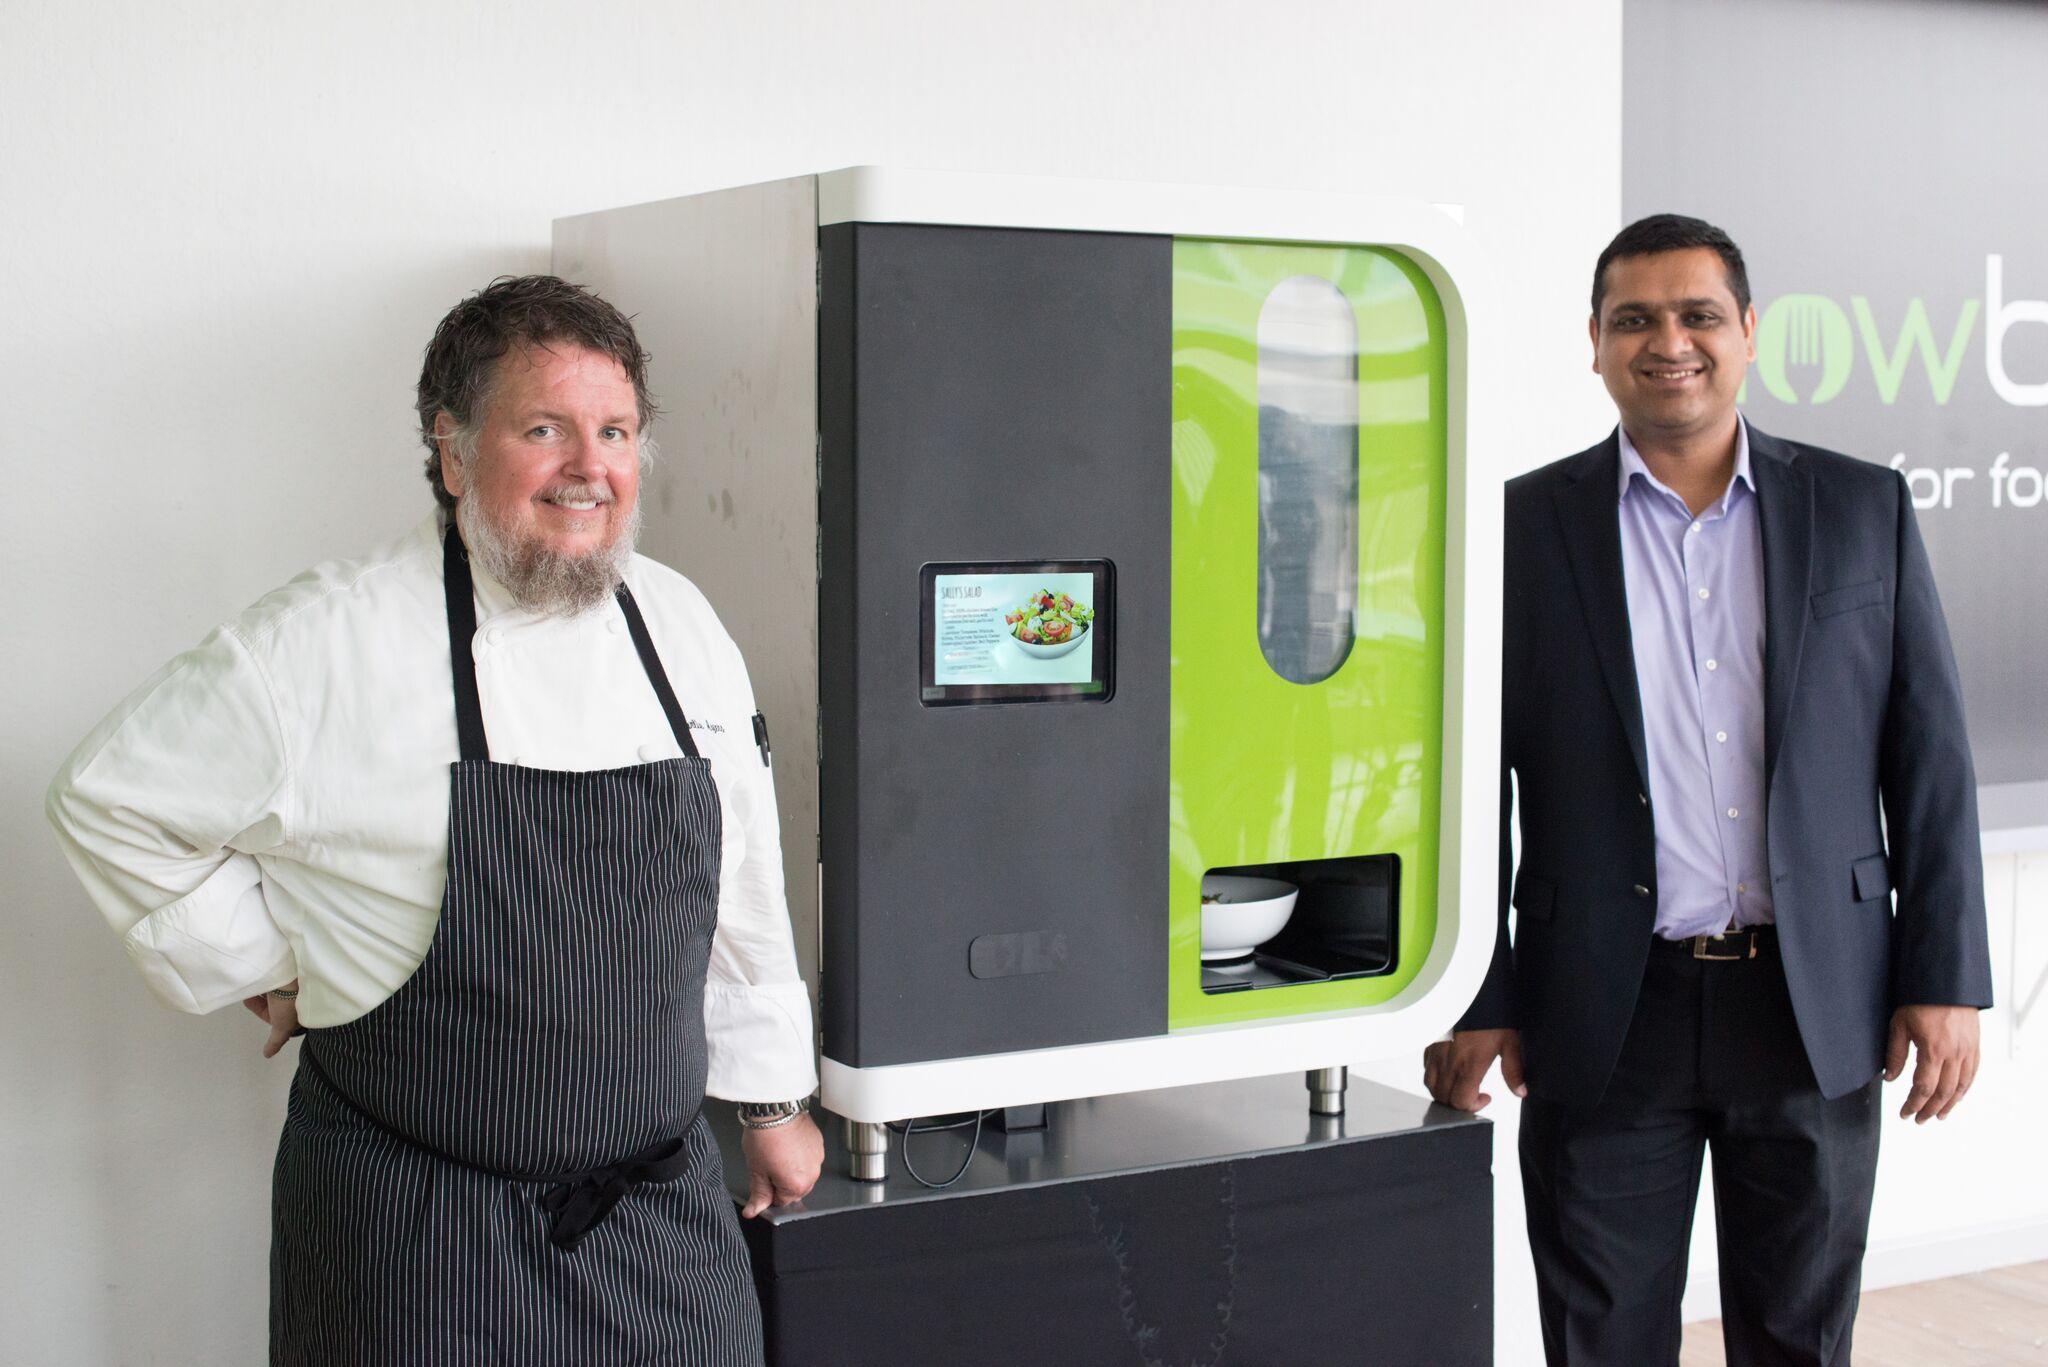 Edible Innovations: Meet Sally, a Salad-Making Robot